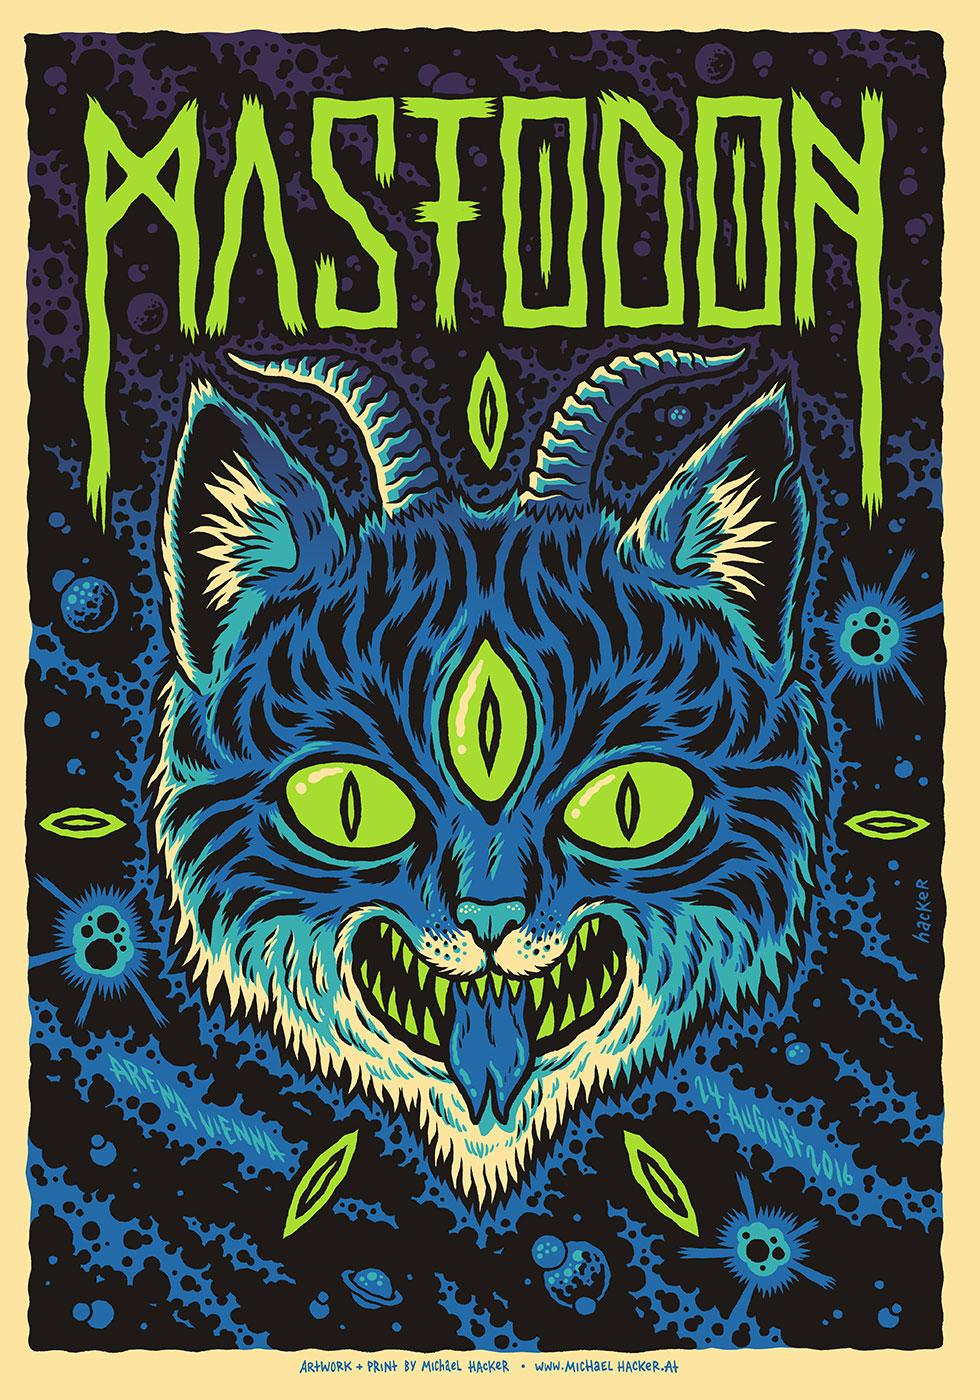 Mastodon Arena Vienna gig poster by Michael Hacker